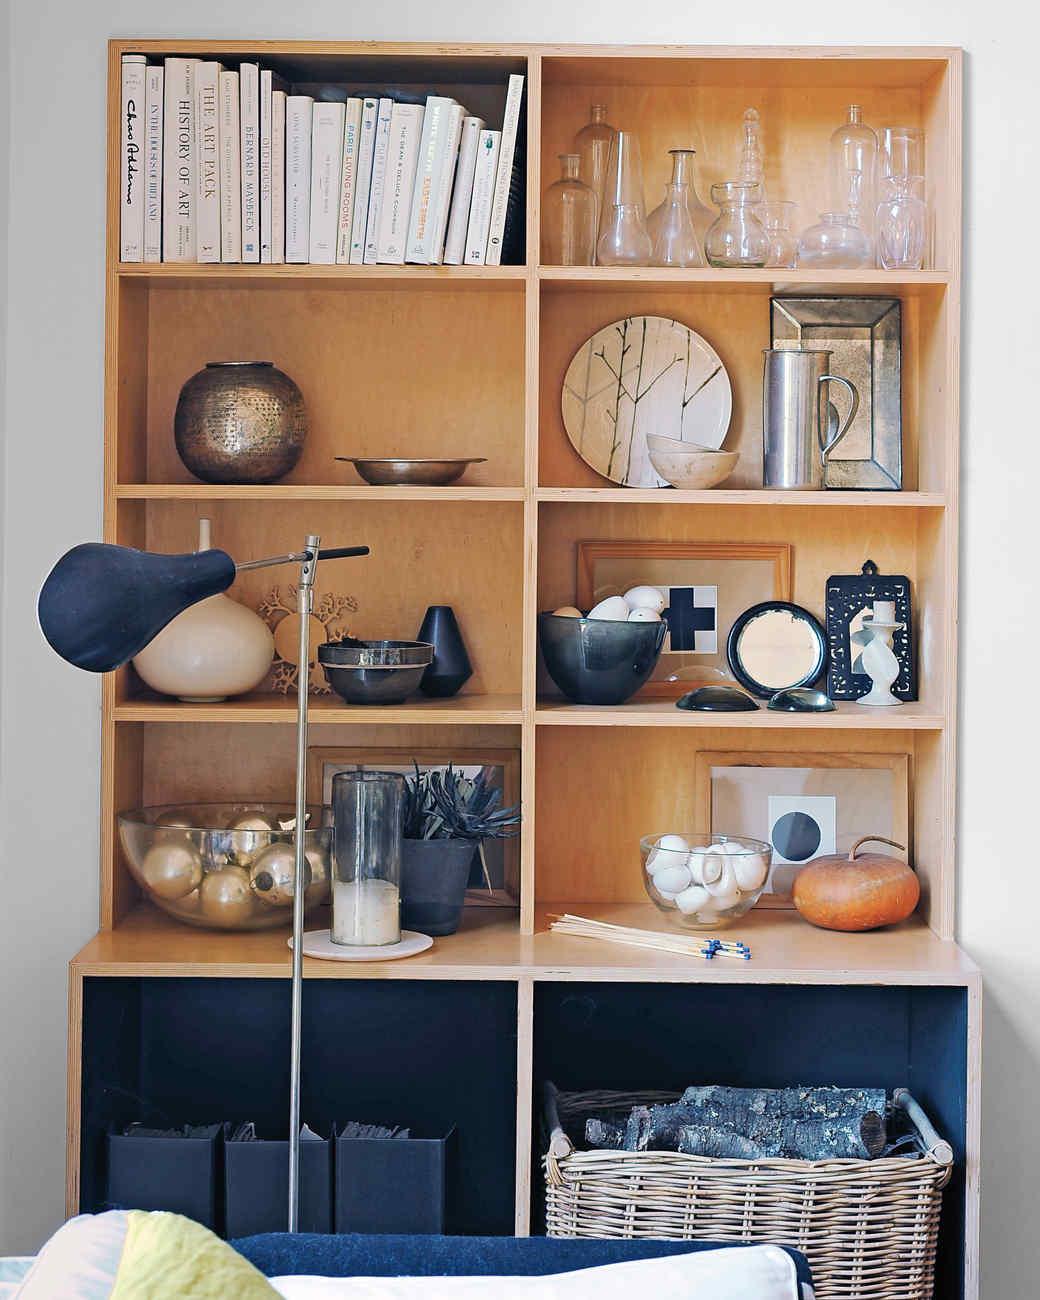 cabinets-2-ms110496.jpg